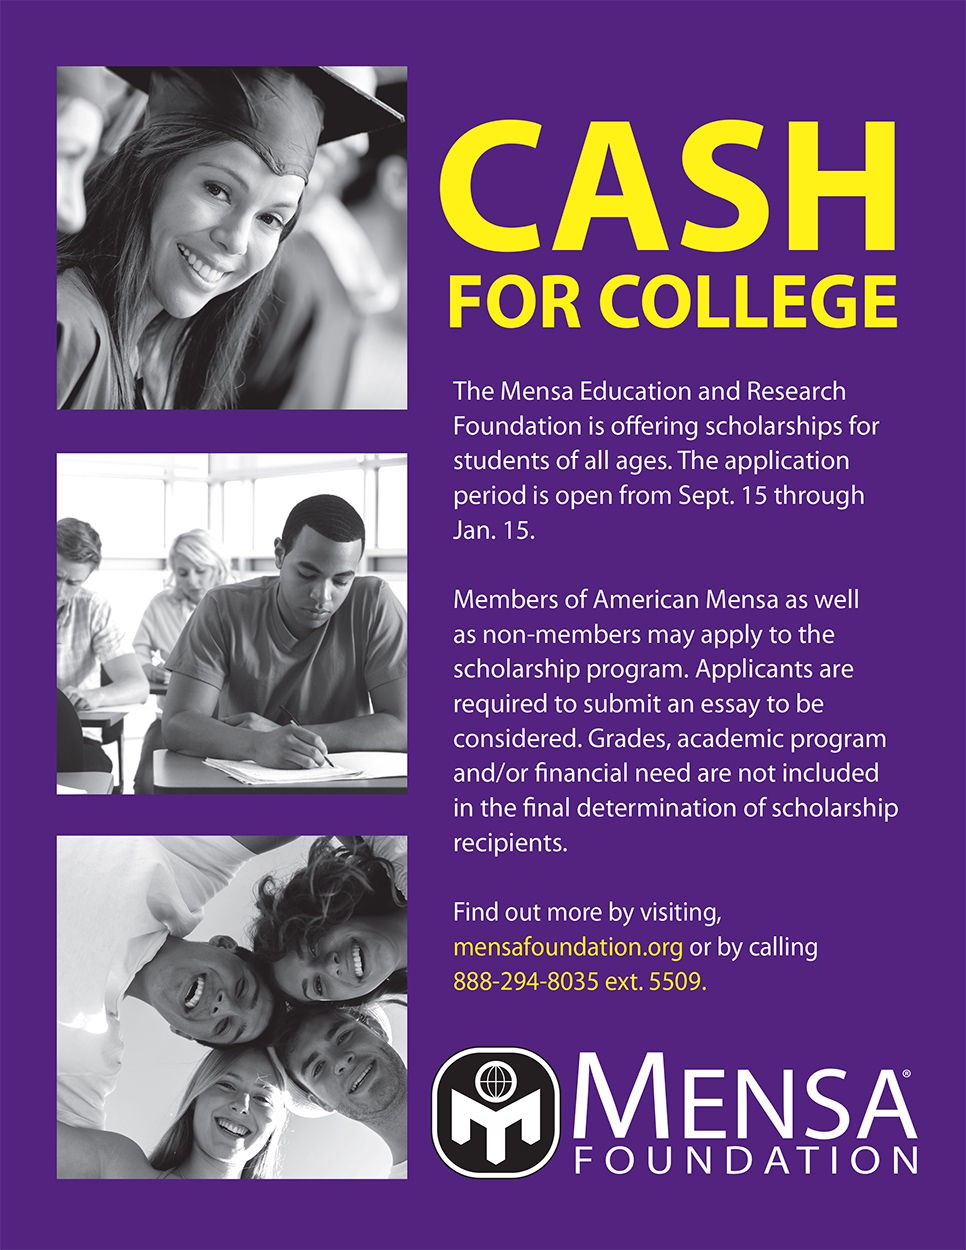 MensaFoundation_Scholarship_8.5x11_20150902